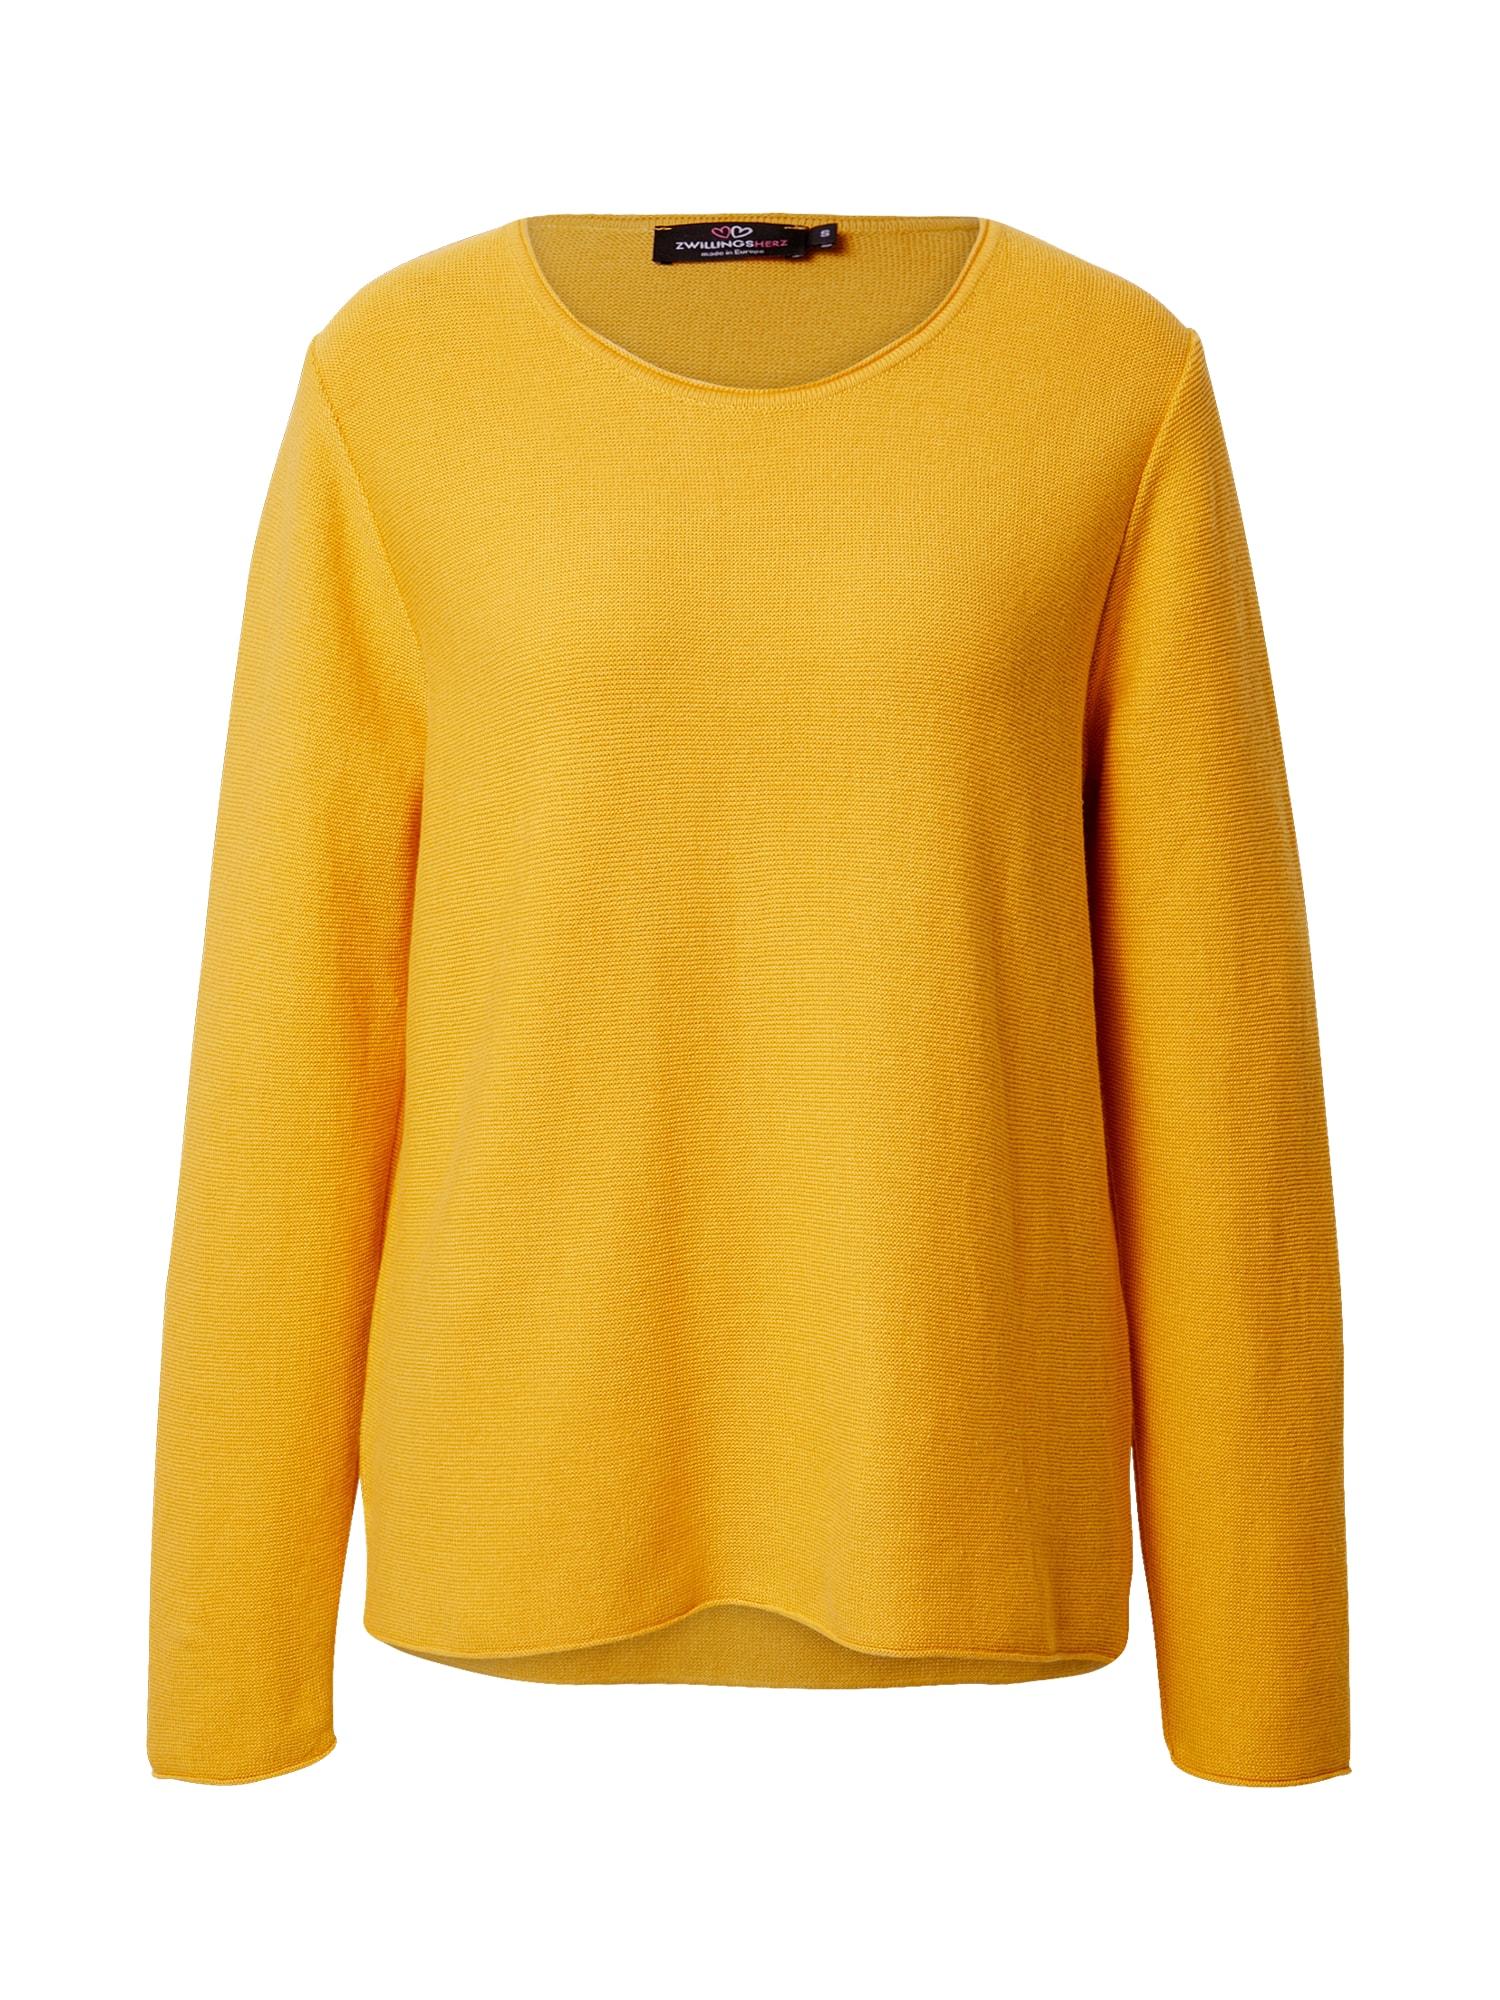 Zwillingsherz Megztinis garstyčių spalva